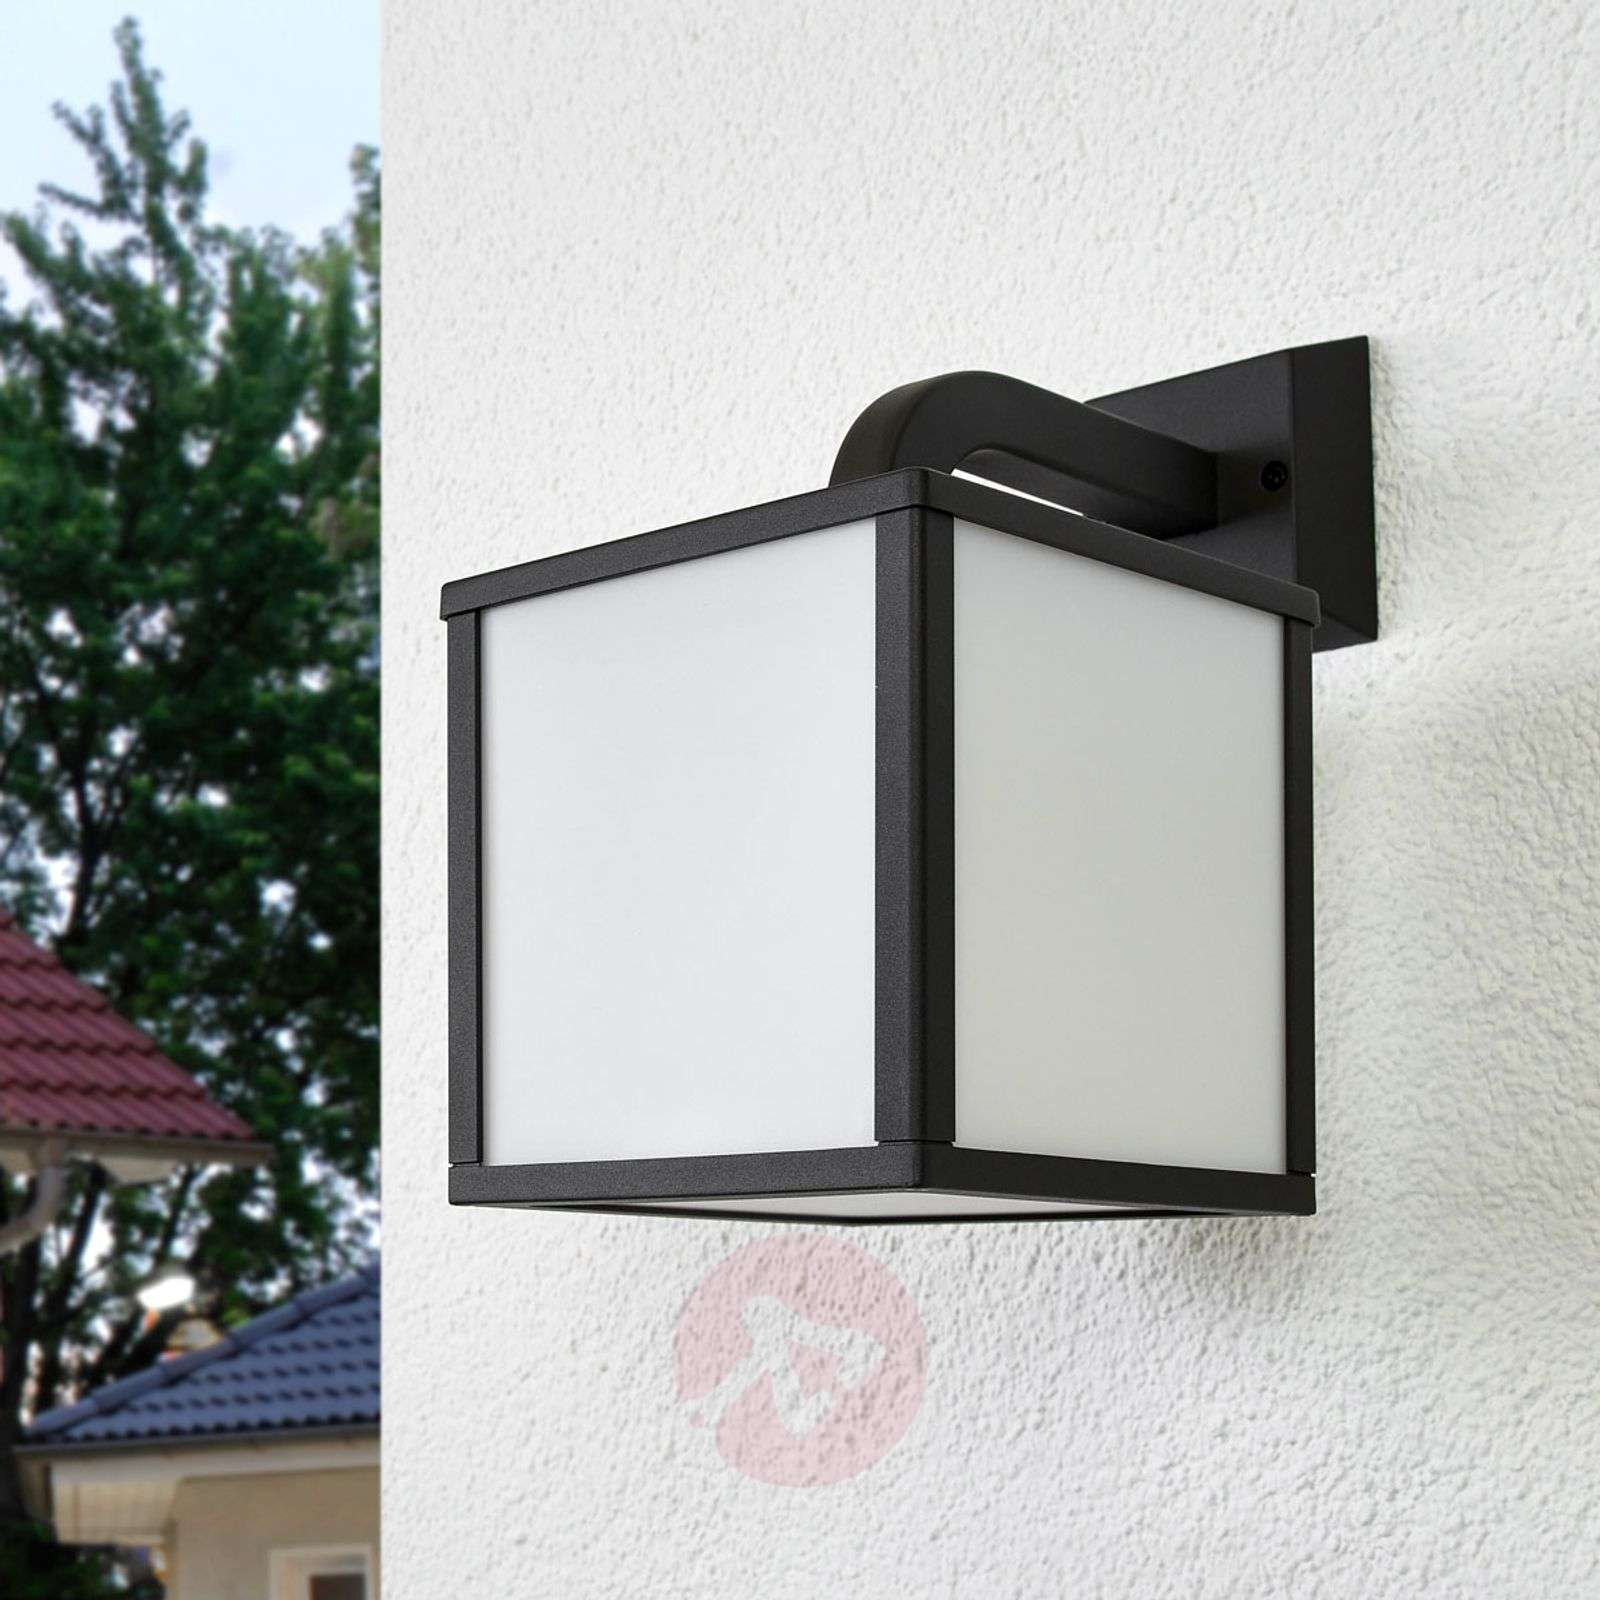 Cubango moderni LED-ulkoseinälamppu-9004729-01